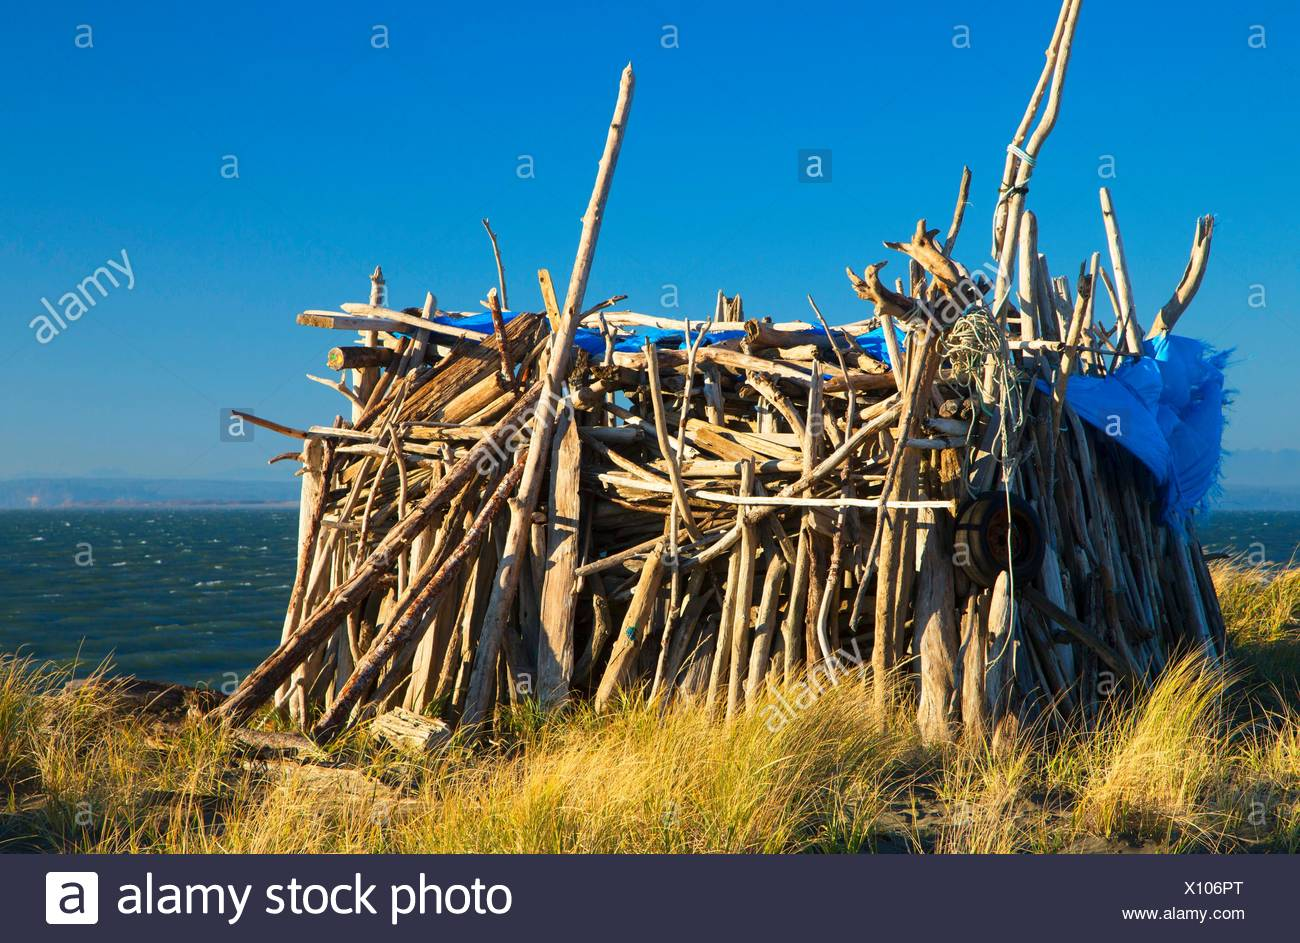 Beach shelter, Damon Point State Park, Washington. - Stock Image